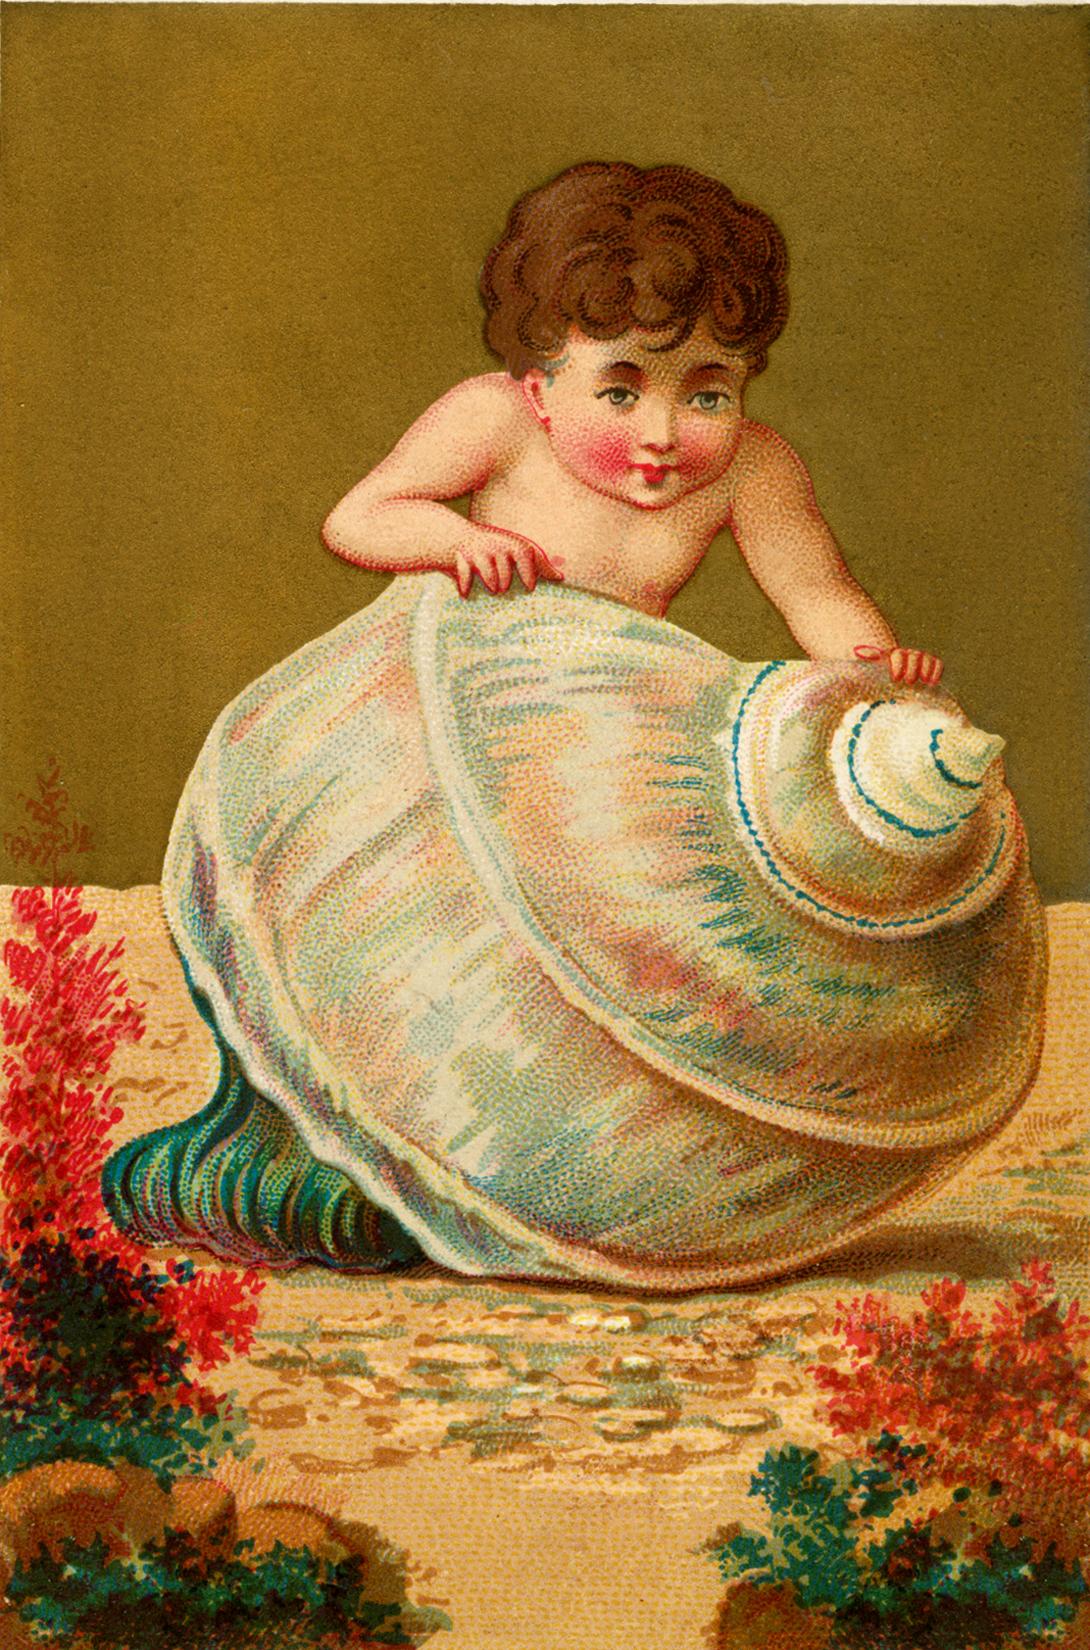 Seashell Child Image The Graphics Fairy